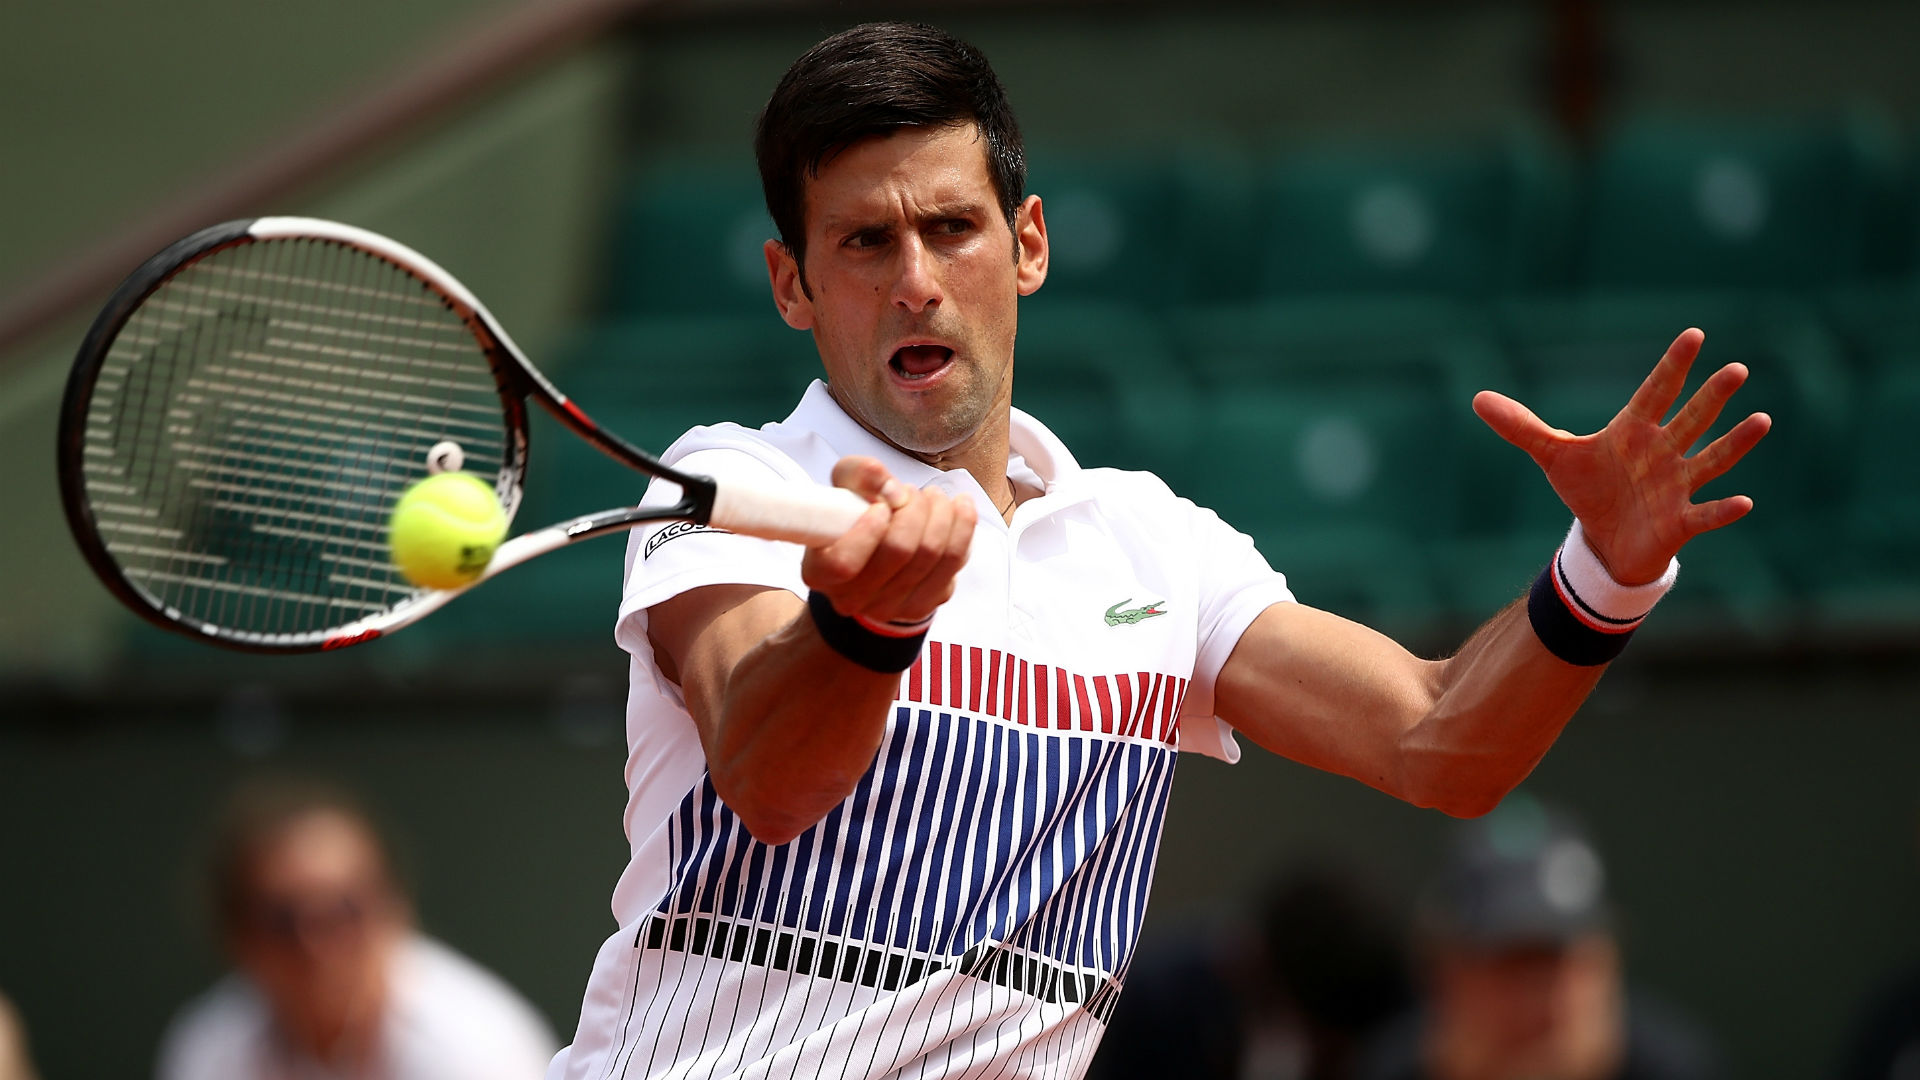 French Open Novak Djokovic Beats Marcel Granollers Sporting News